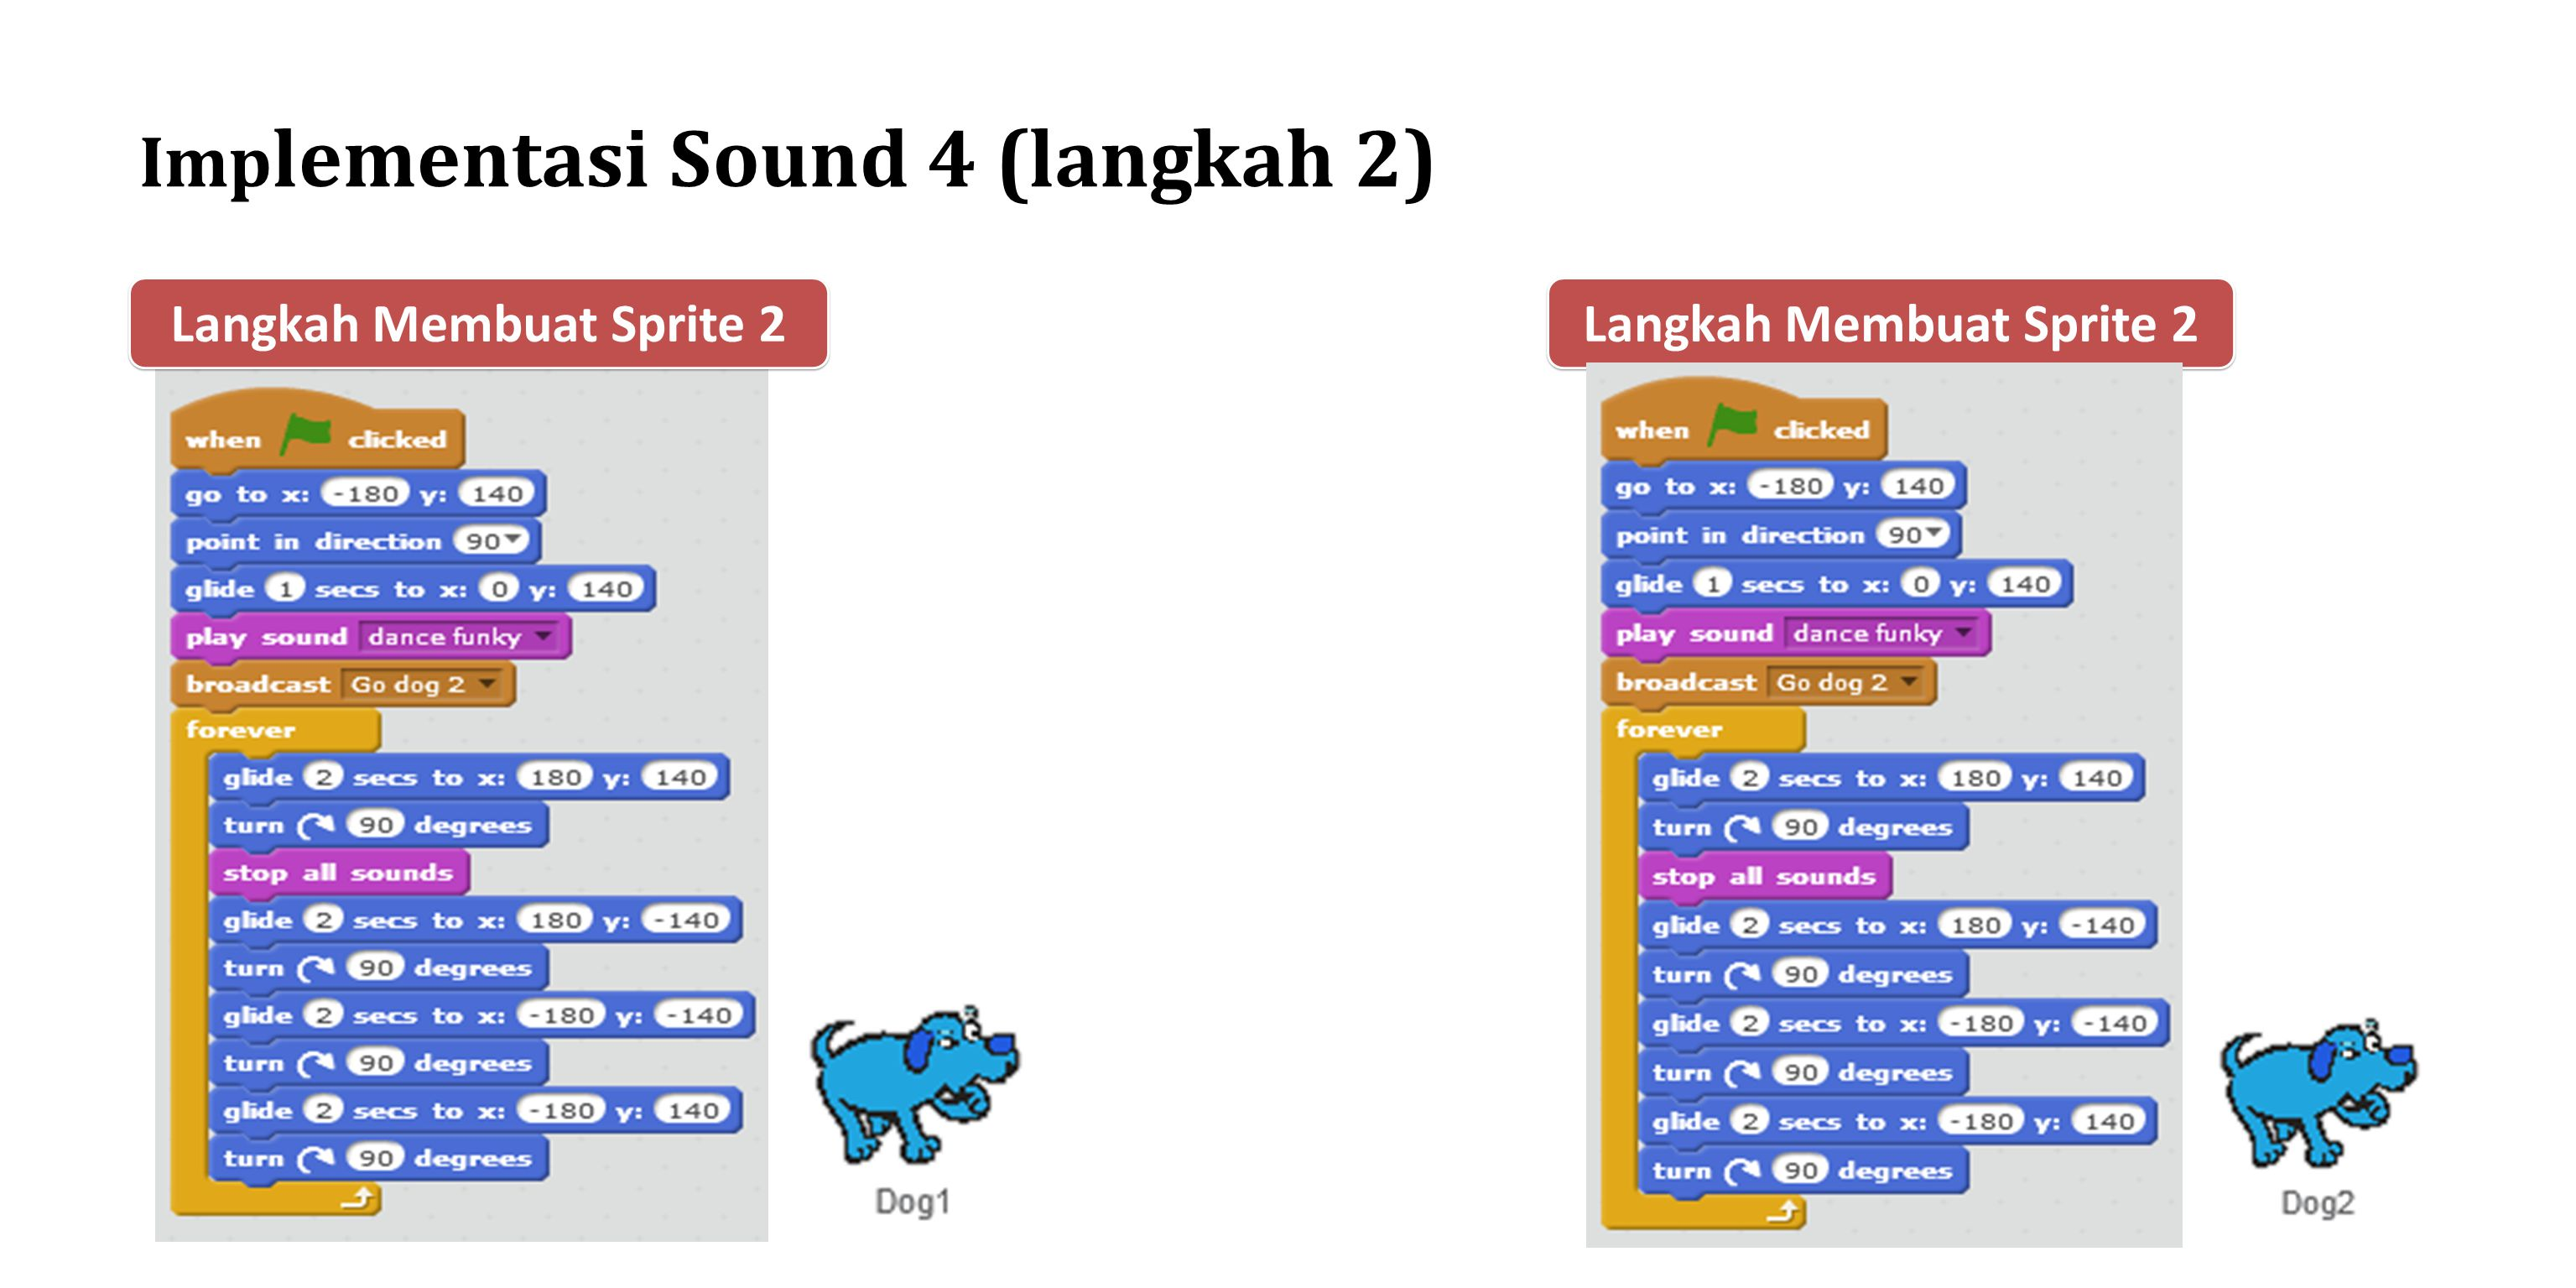 Imp lementasi Sound 4 (langkah 2) Langkah Membuat Sprite 2